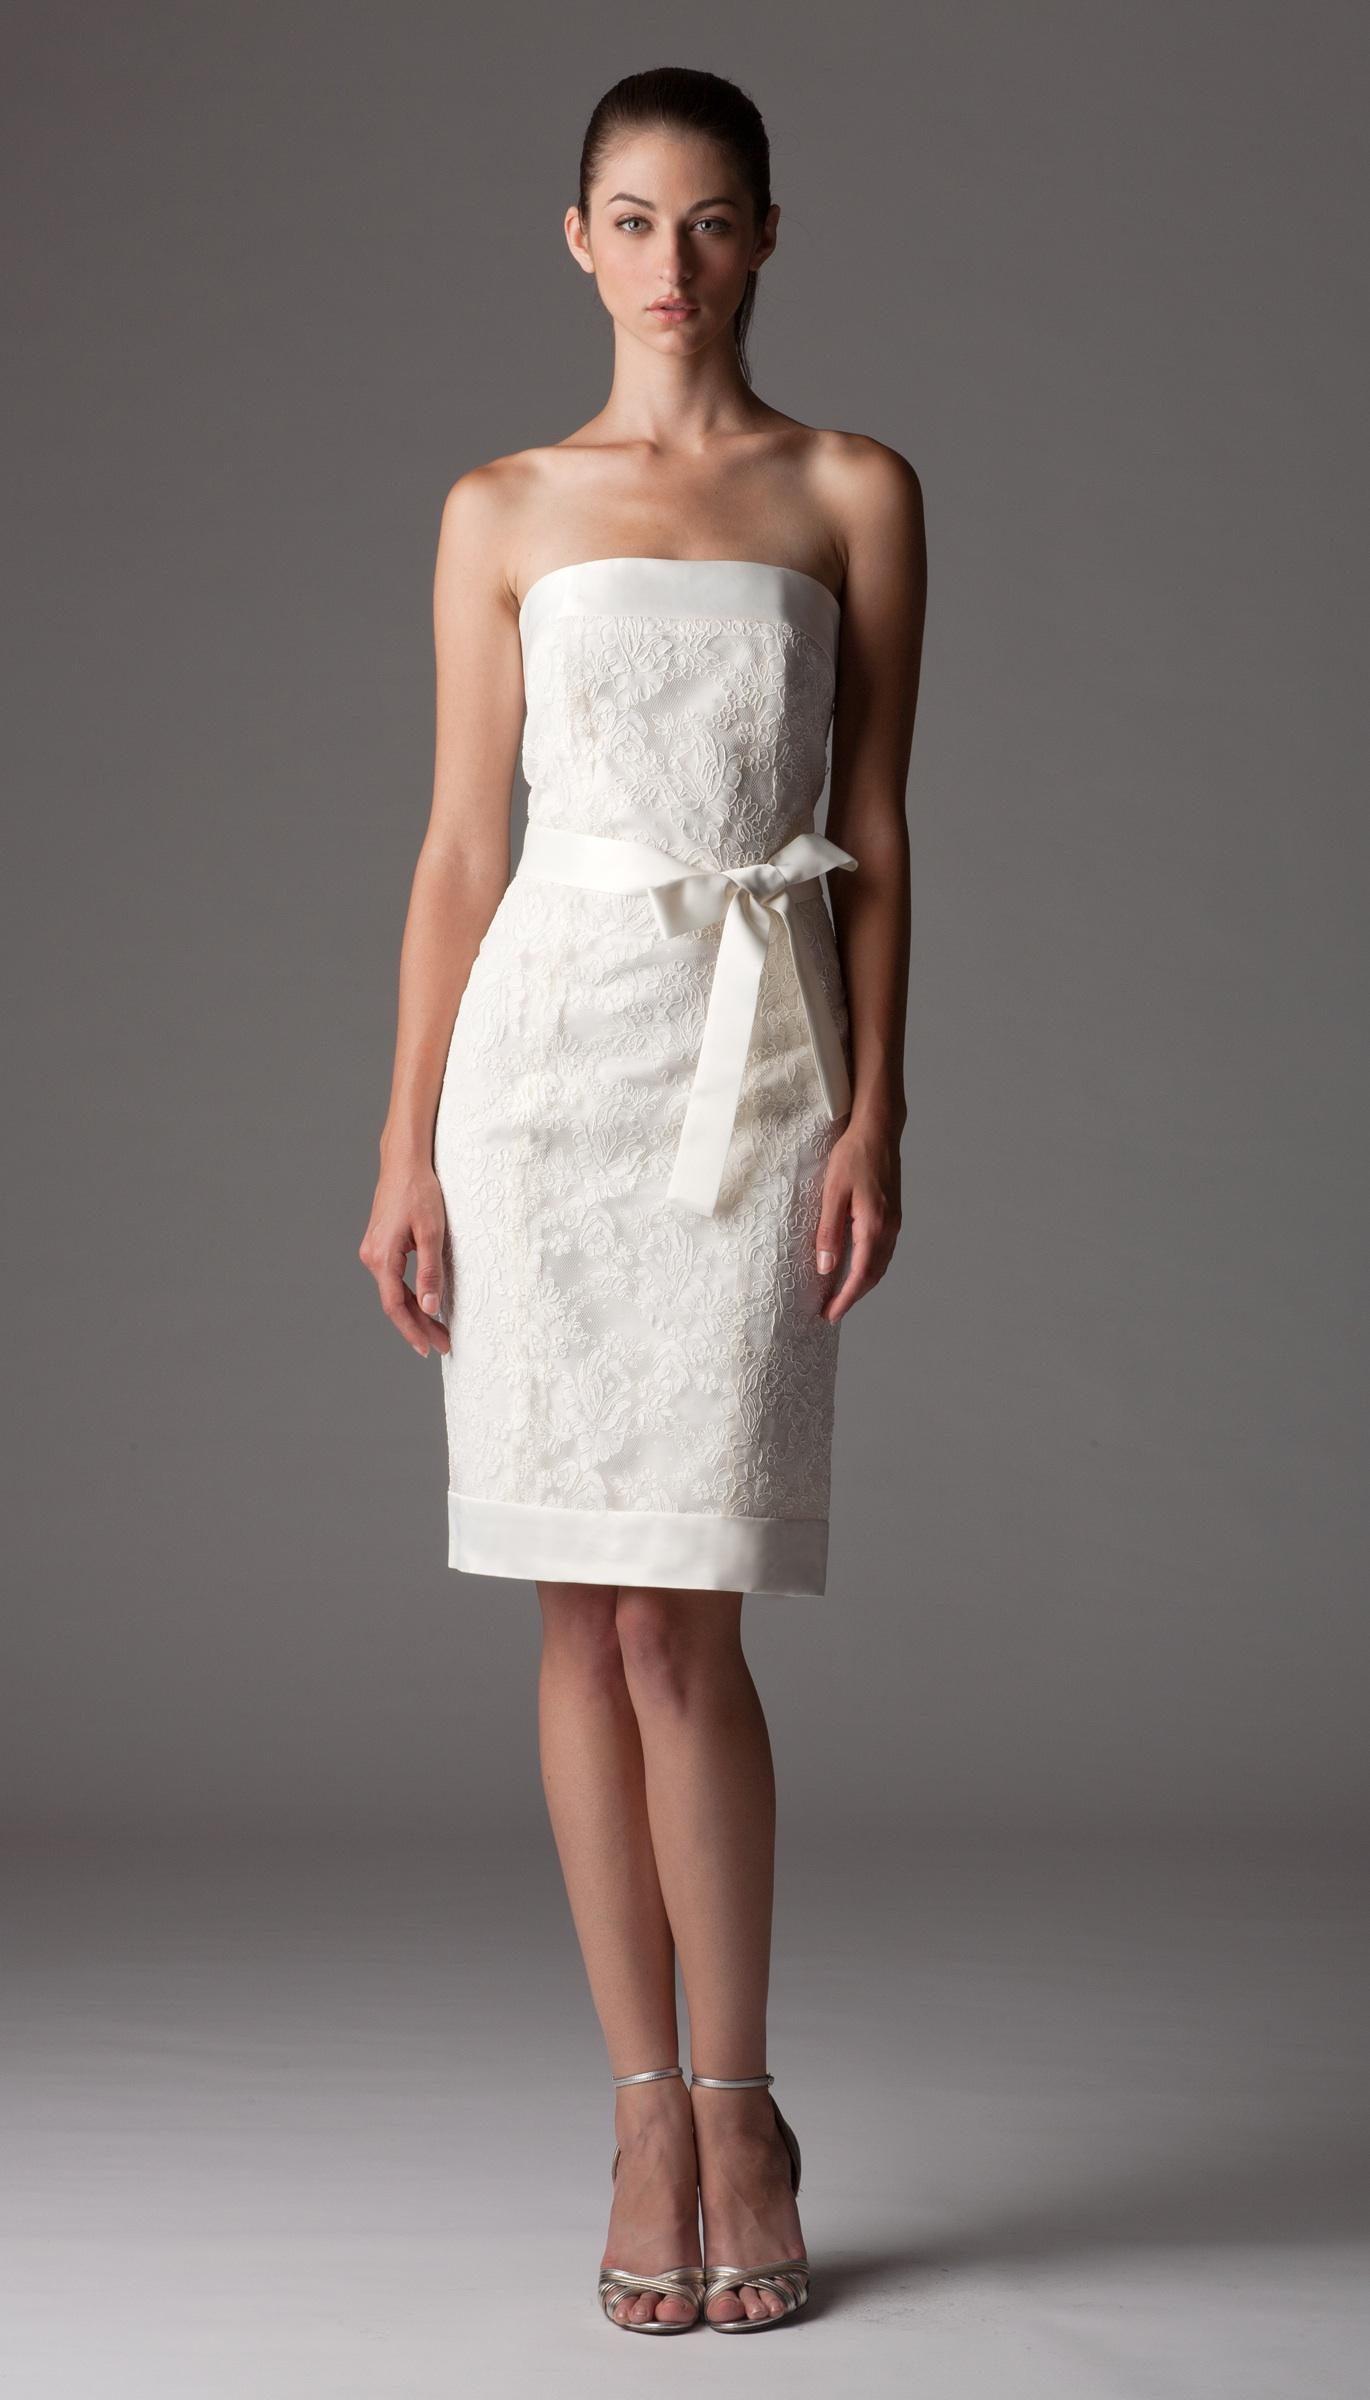 reception dresses for brides reception wedding dresses Similiar White Reception Dresses For Brides Keywords